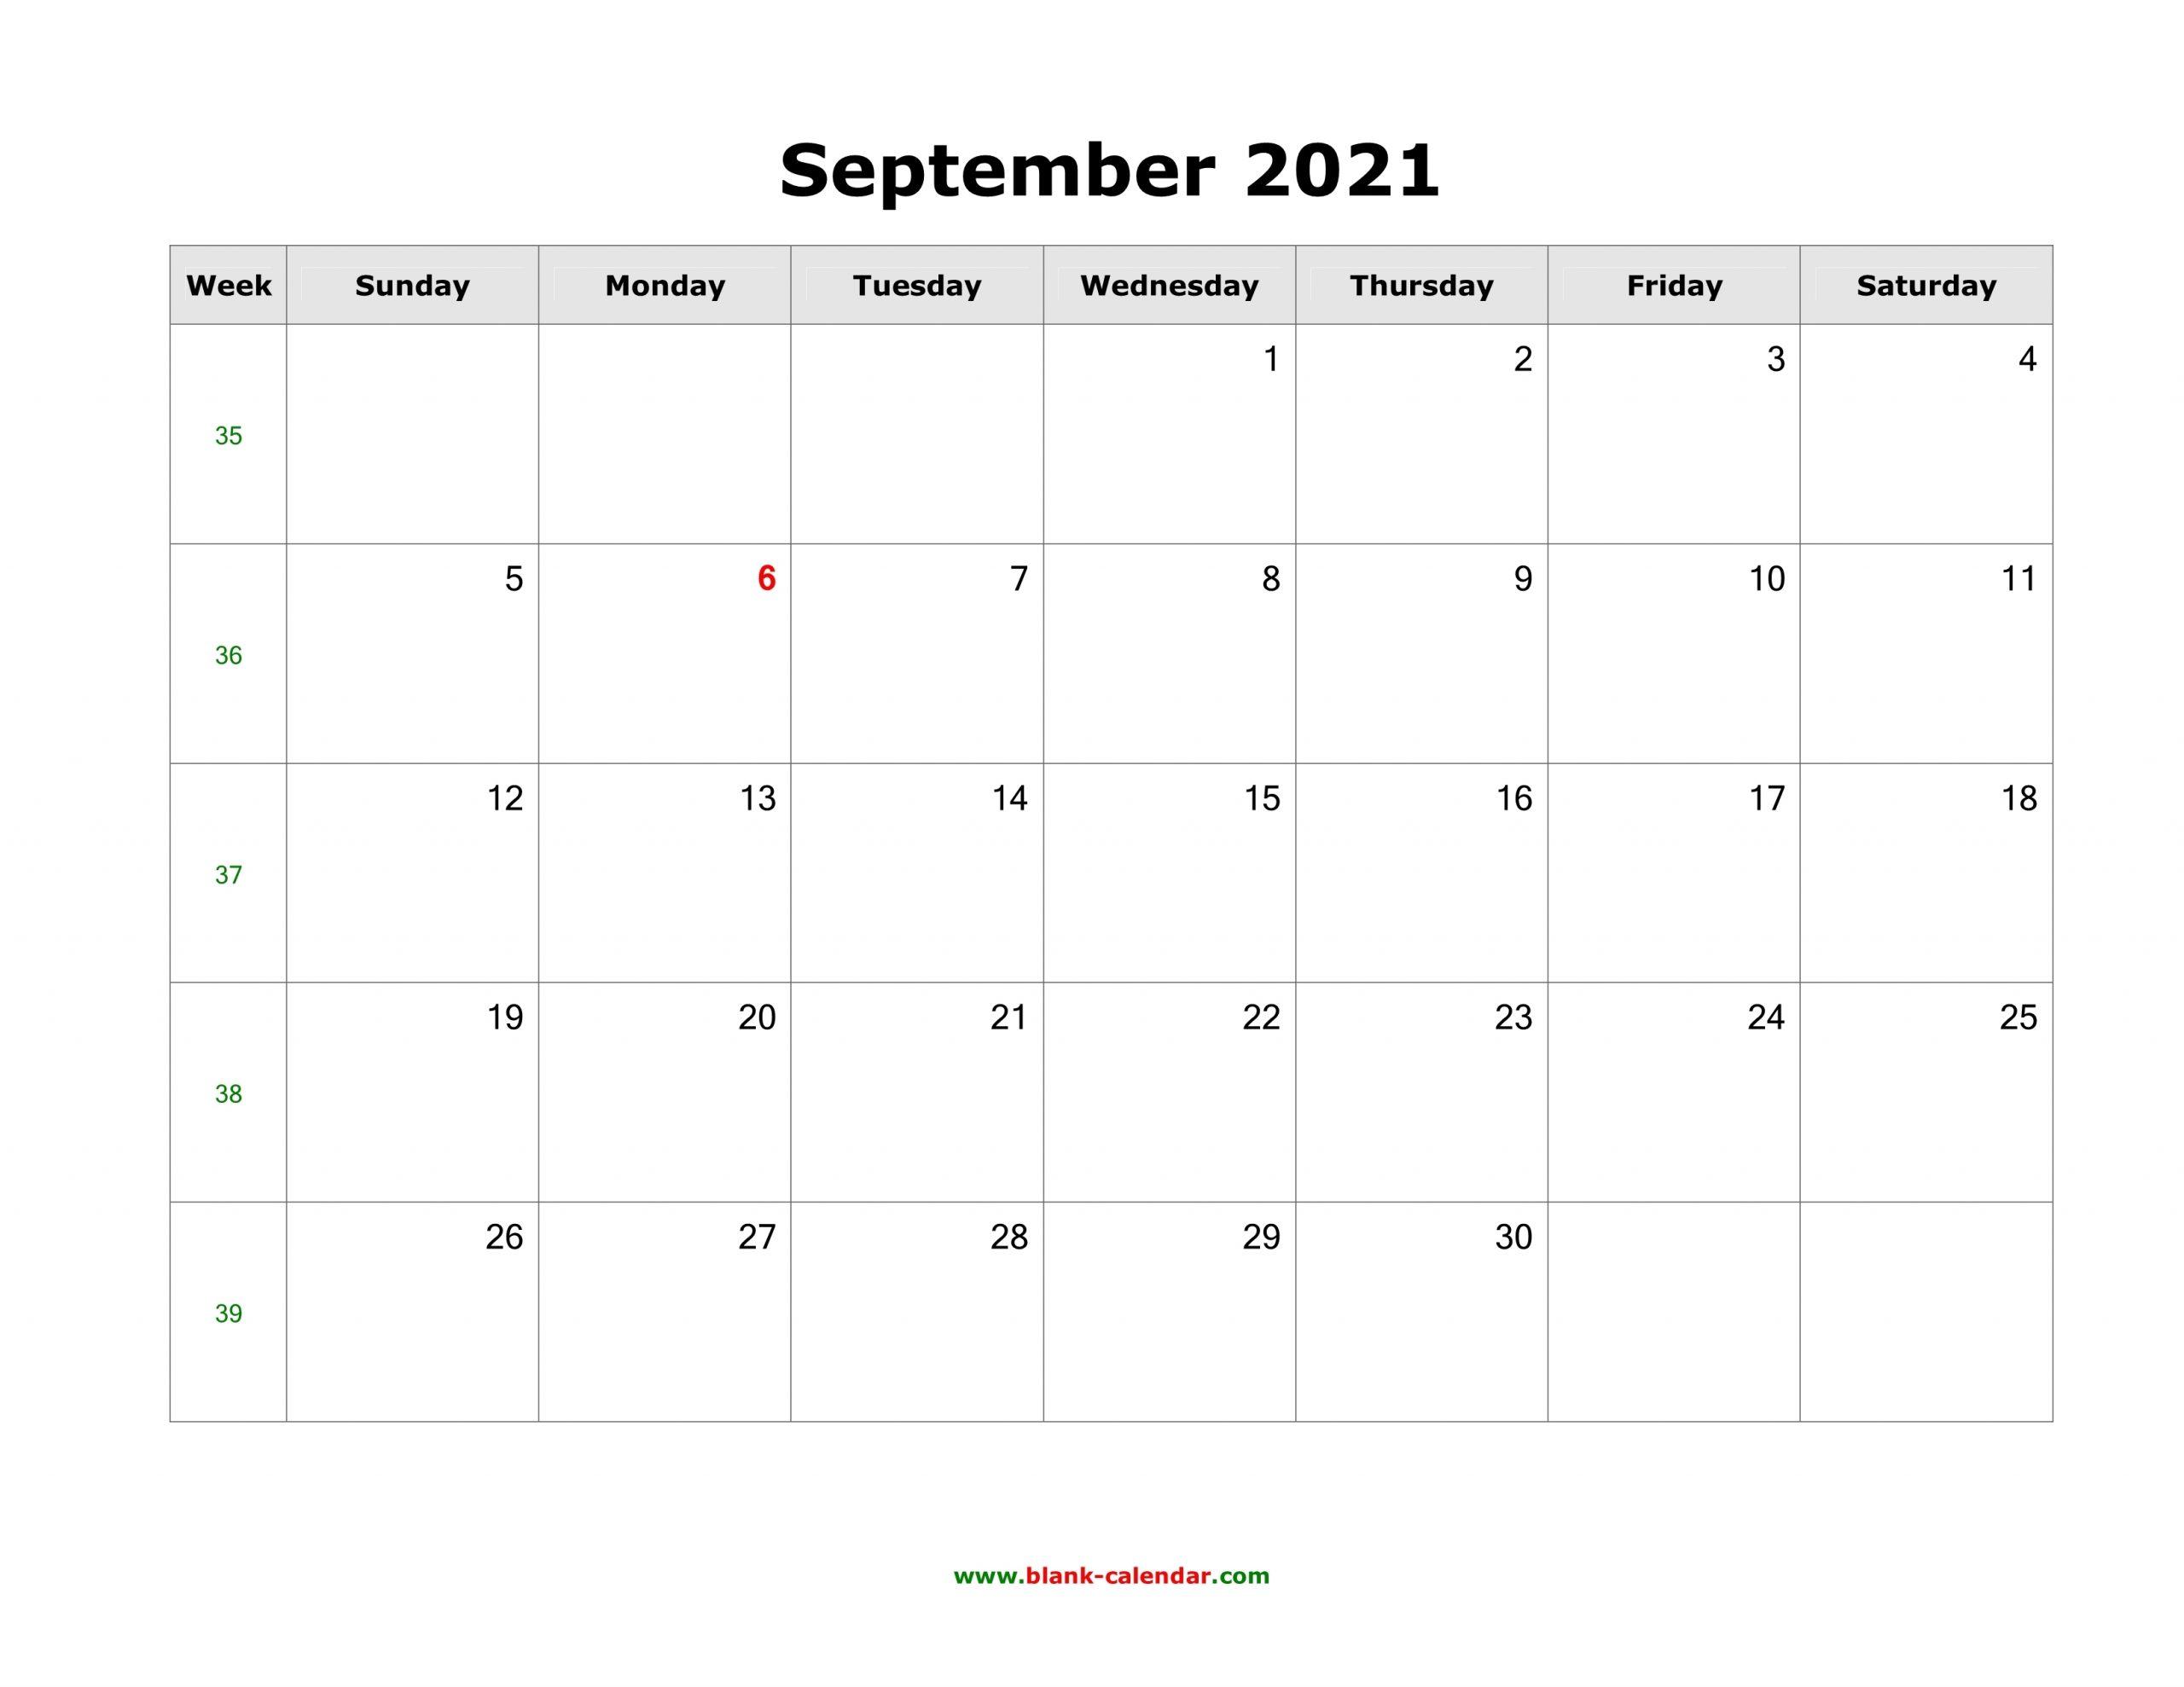 Download September 2021 Blank Calendar (Horizontal)